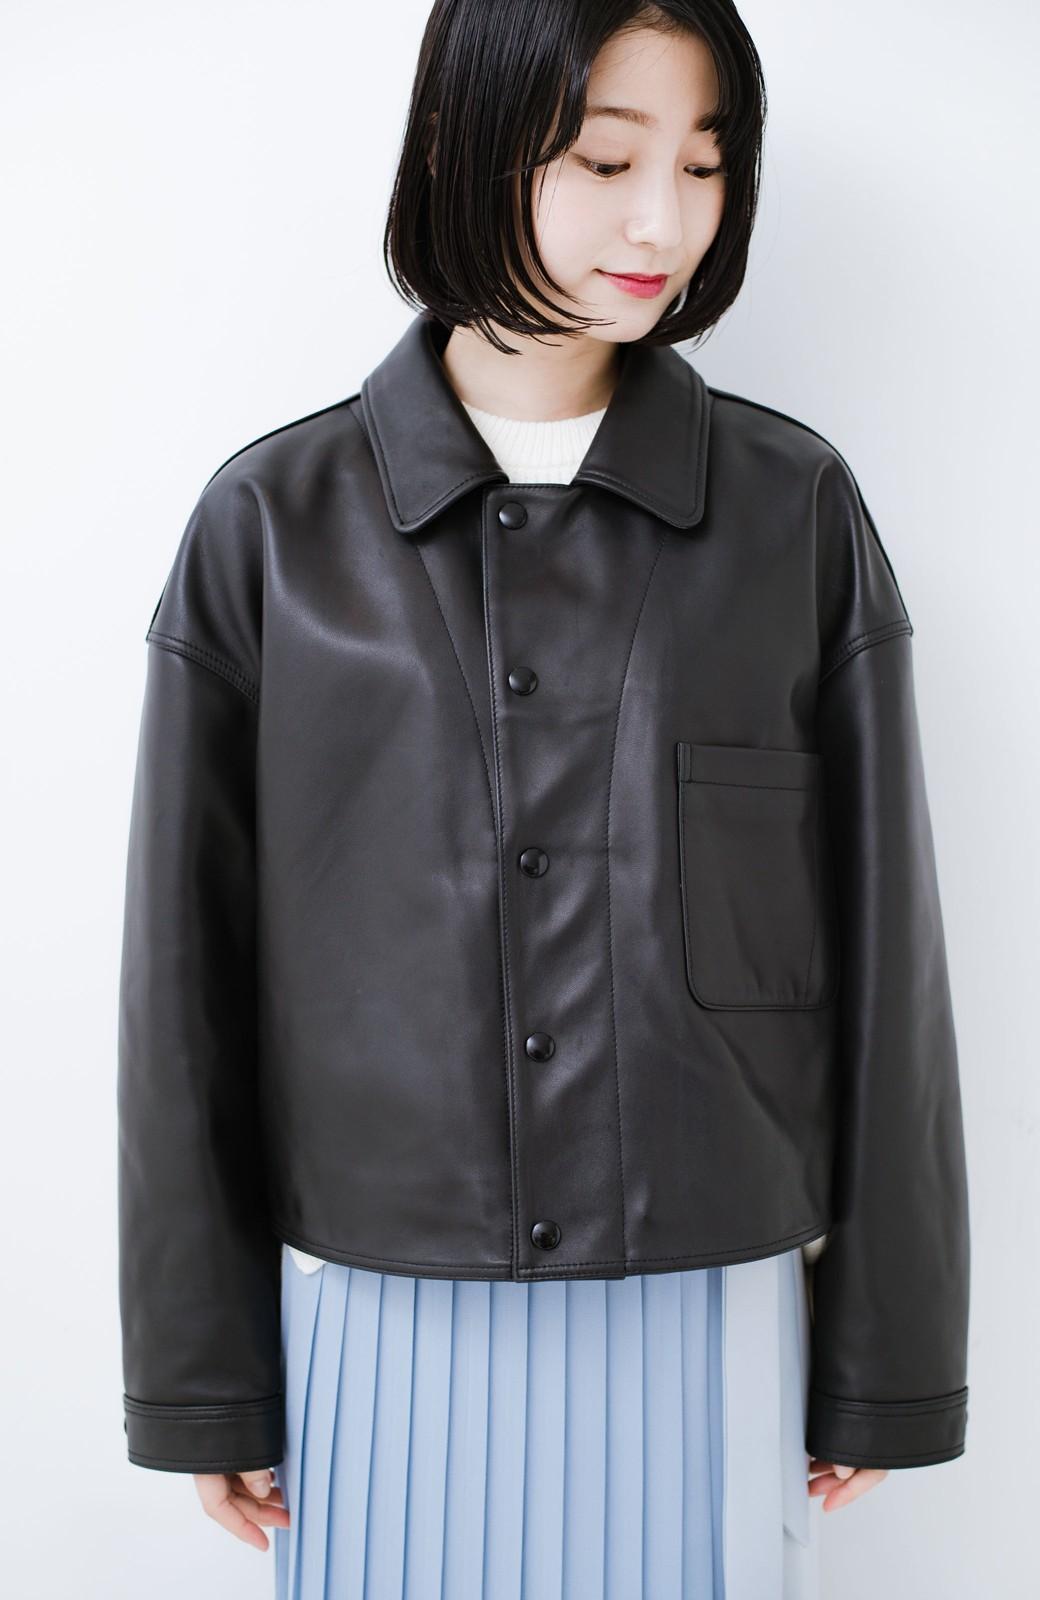 haco! BOLSISTA スナップボタンのレザージャケット<シングル> <ブラック>の商品写真11